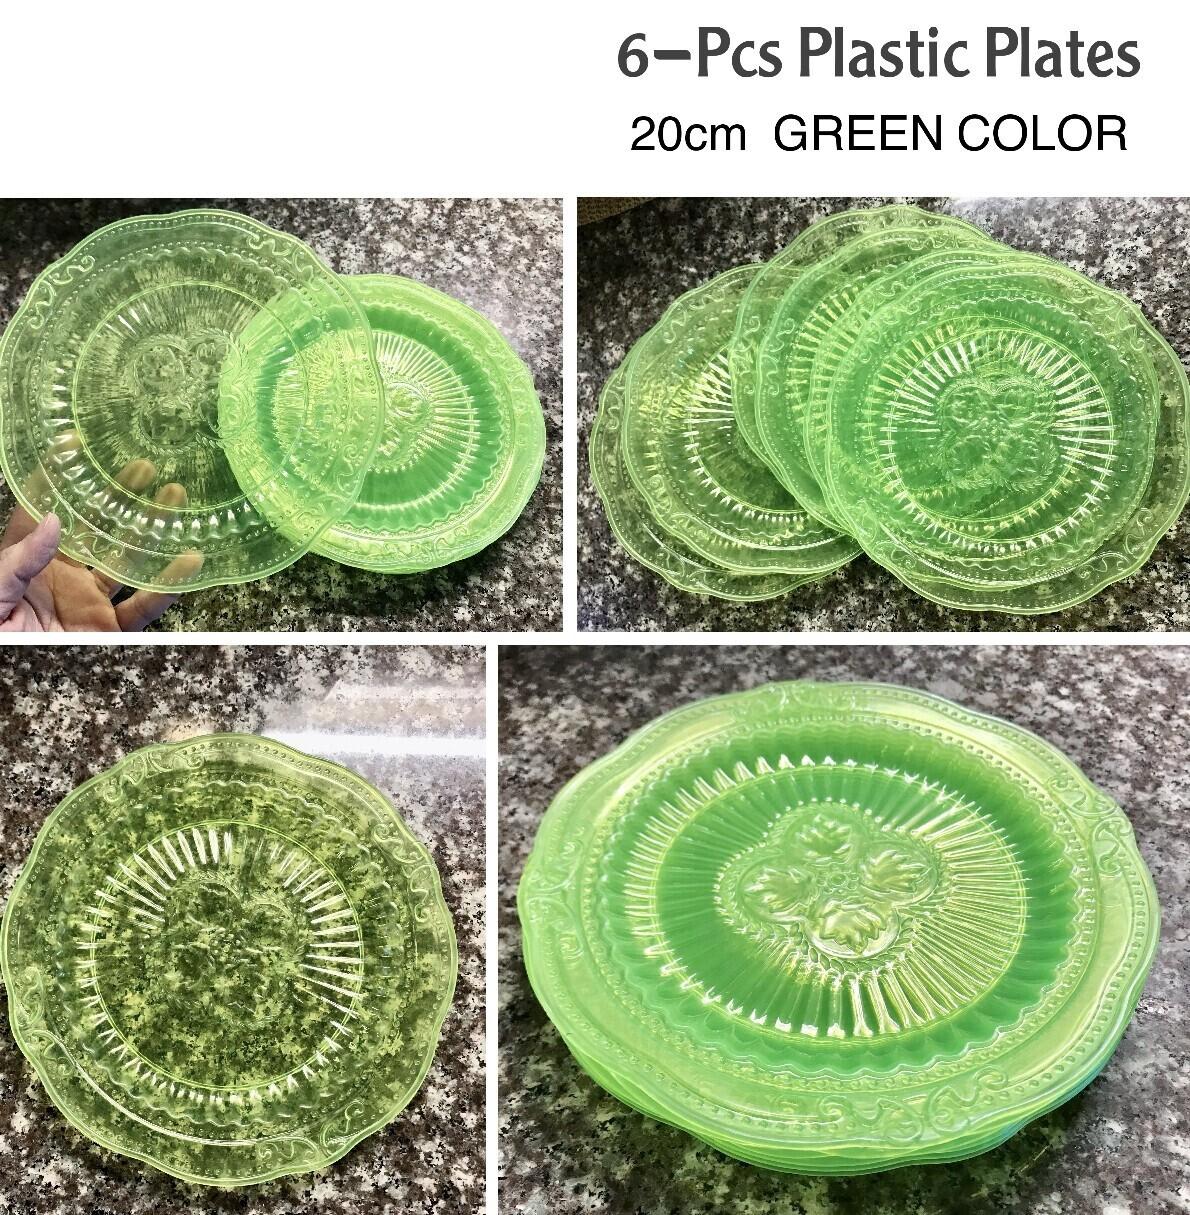 6-Pcs Plastic Plates (Green)